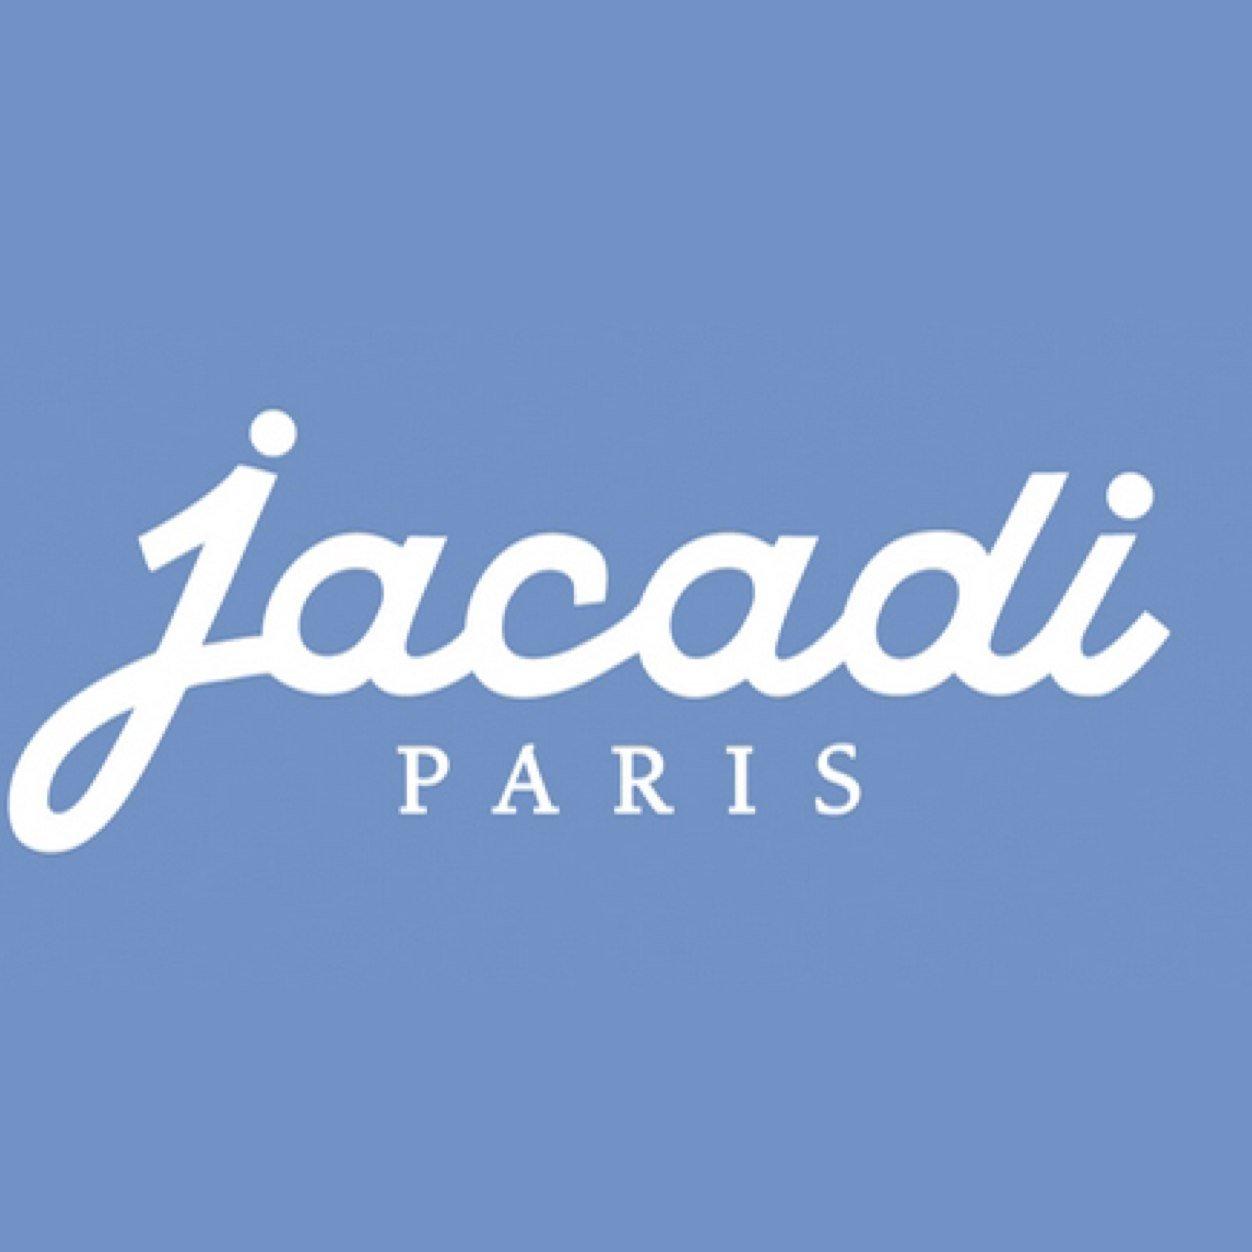 @Jacadiqatar